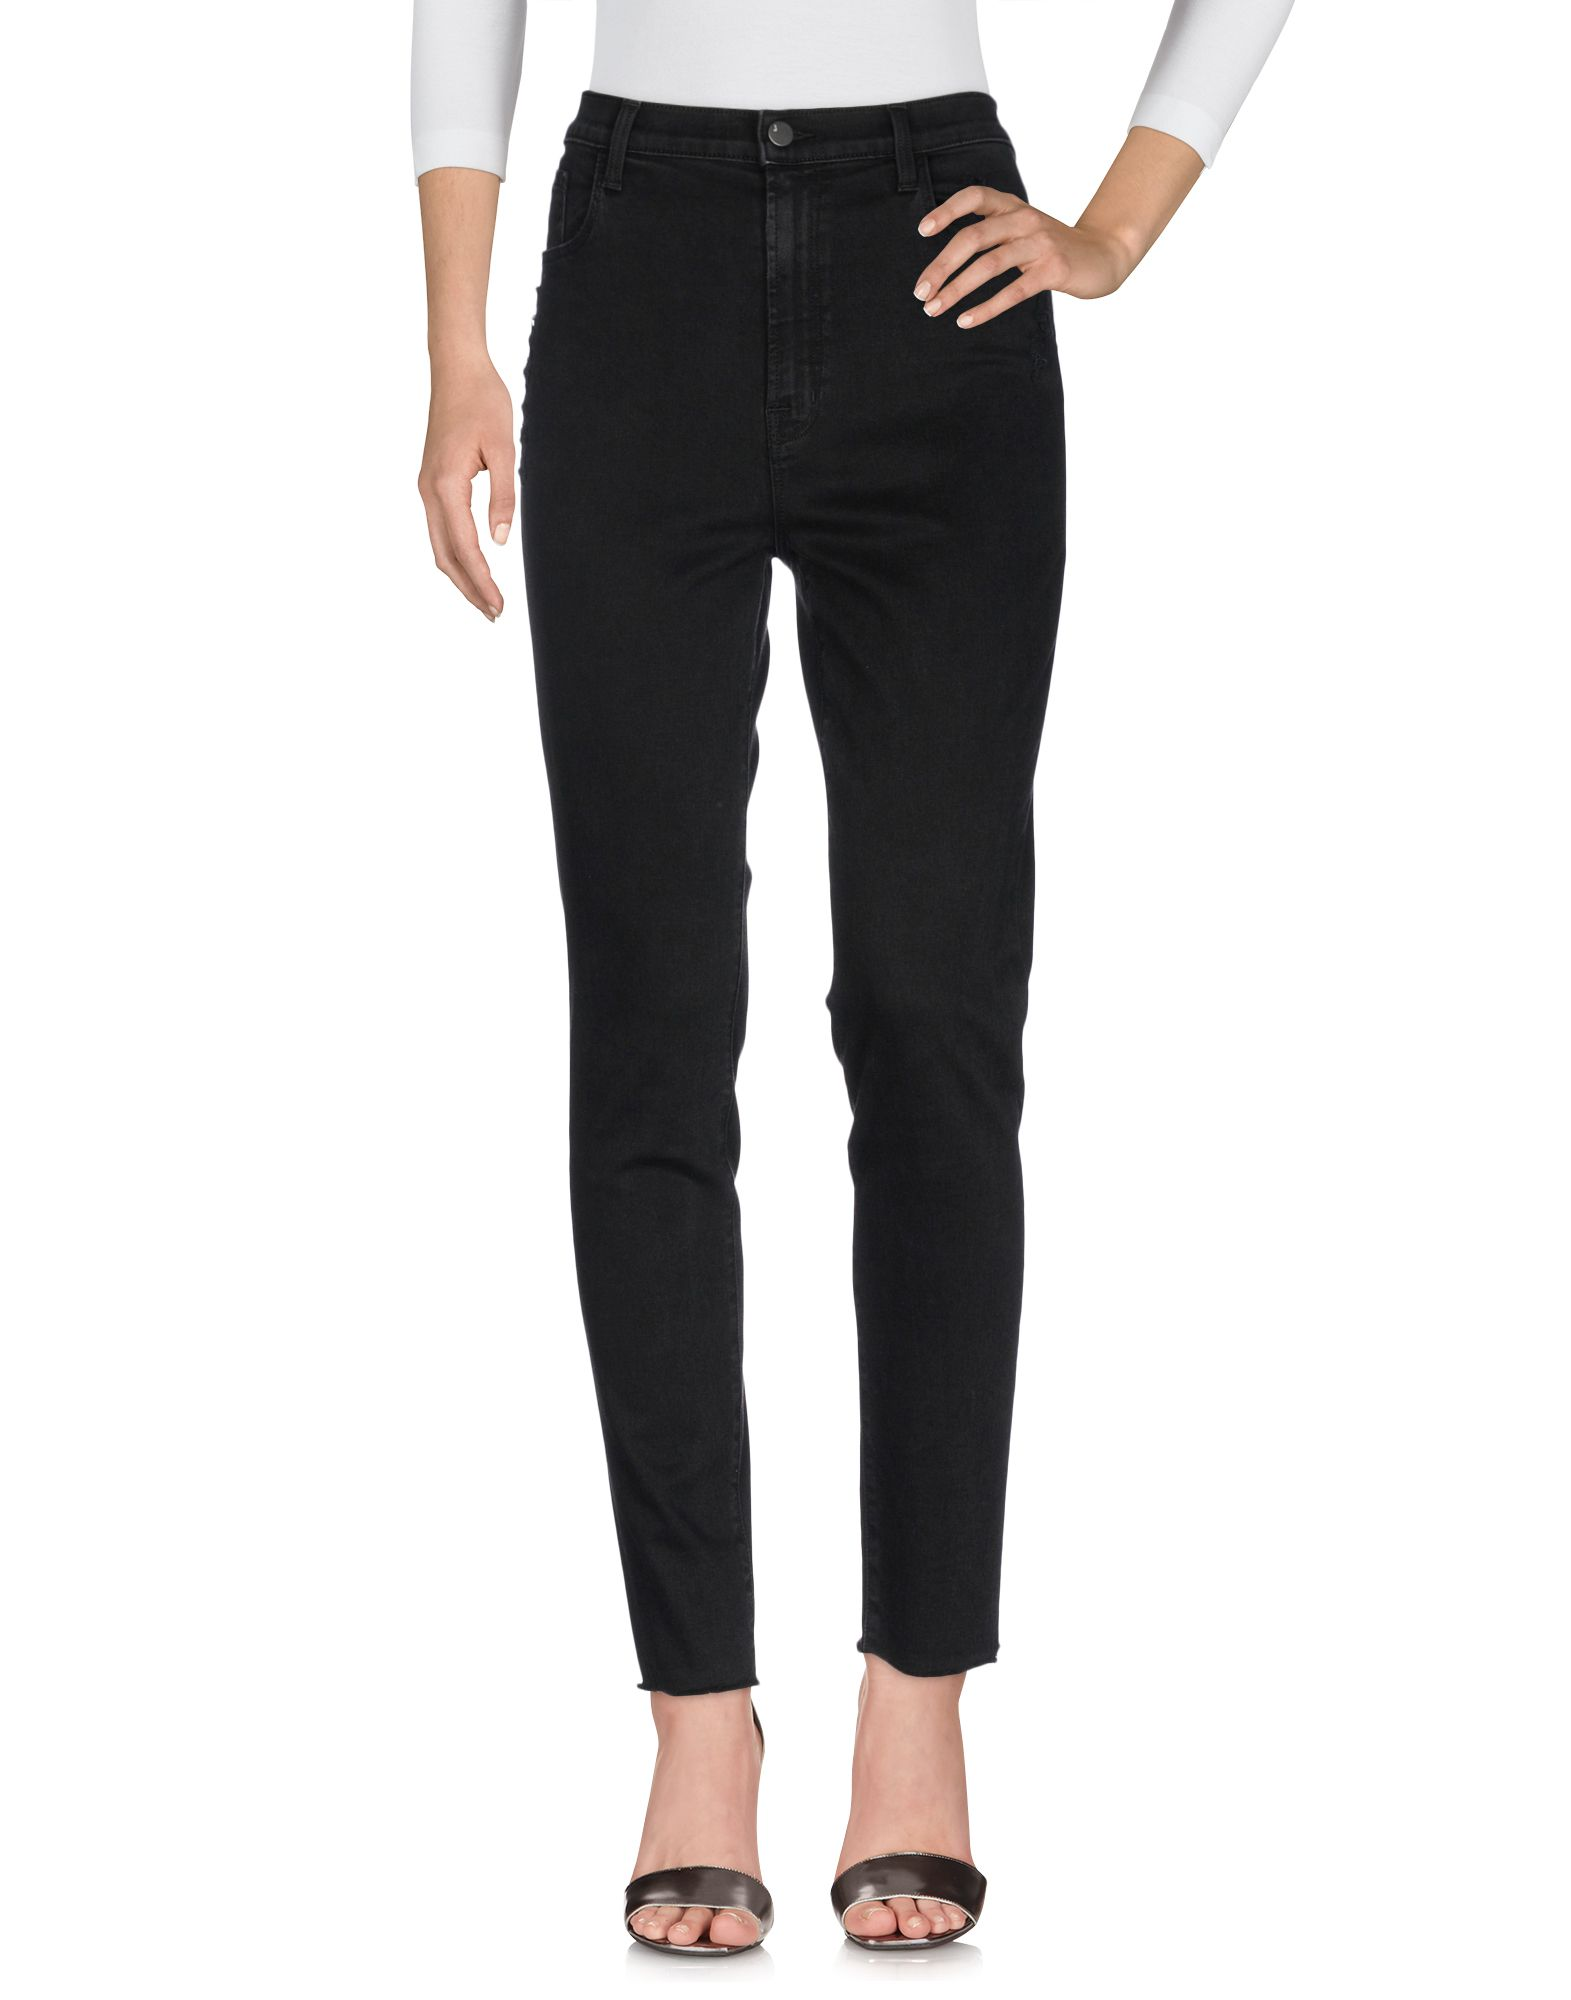 Pantaloni Jeans J Brand Donna - Acquista online su IaRSg